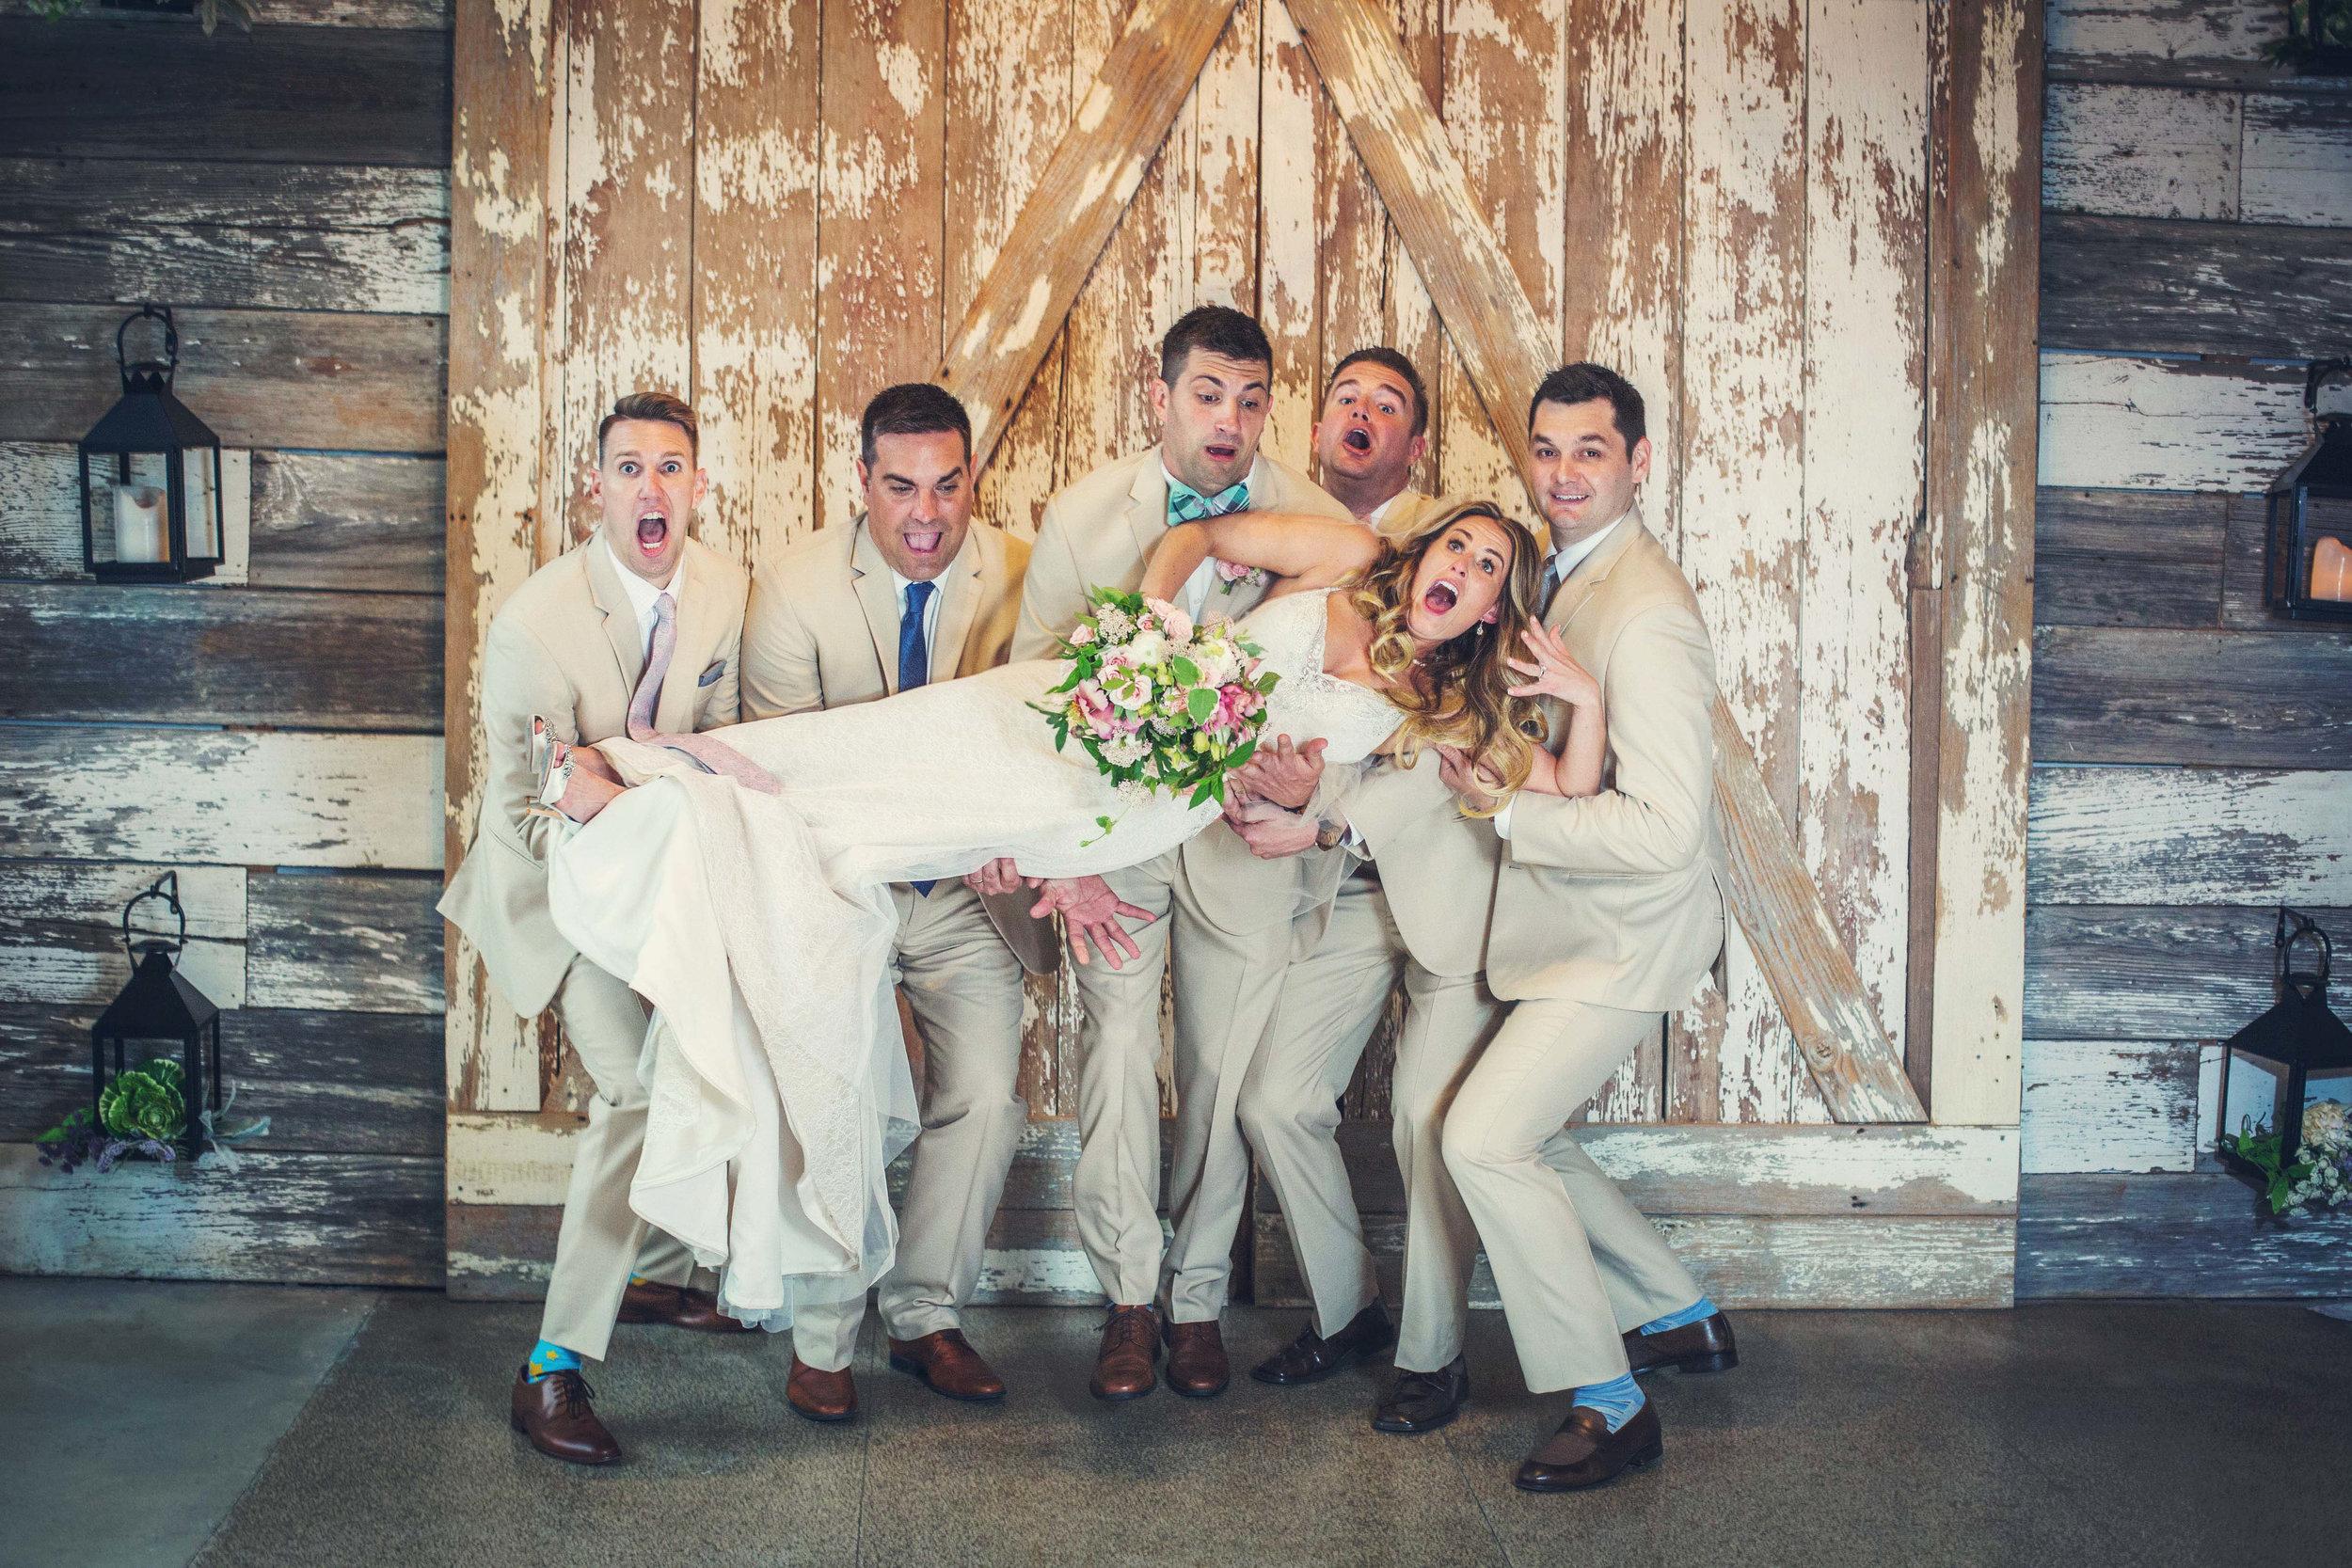 Kansas+City_Small+Wedding_Elope_Intimate_Ceremony_Best+Friends_Megan & Jeff-160b.jpg